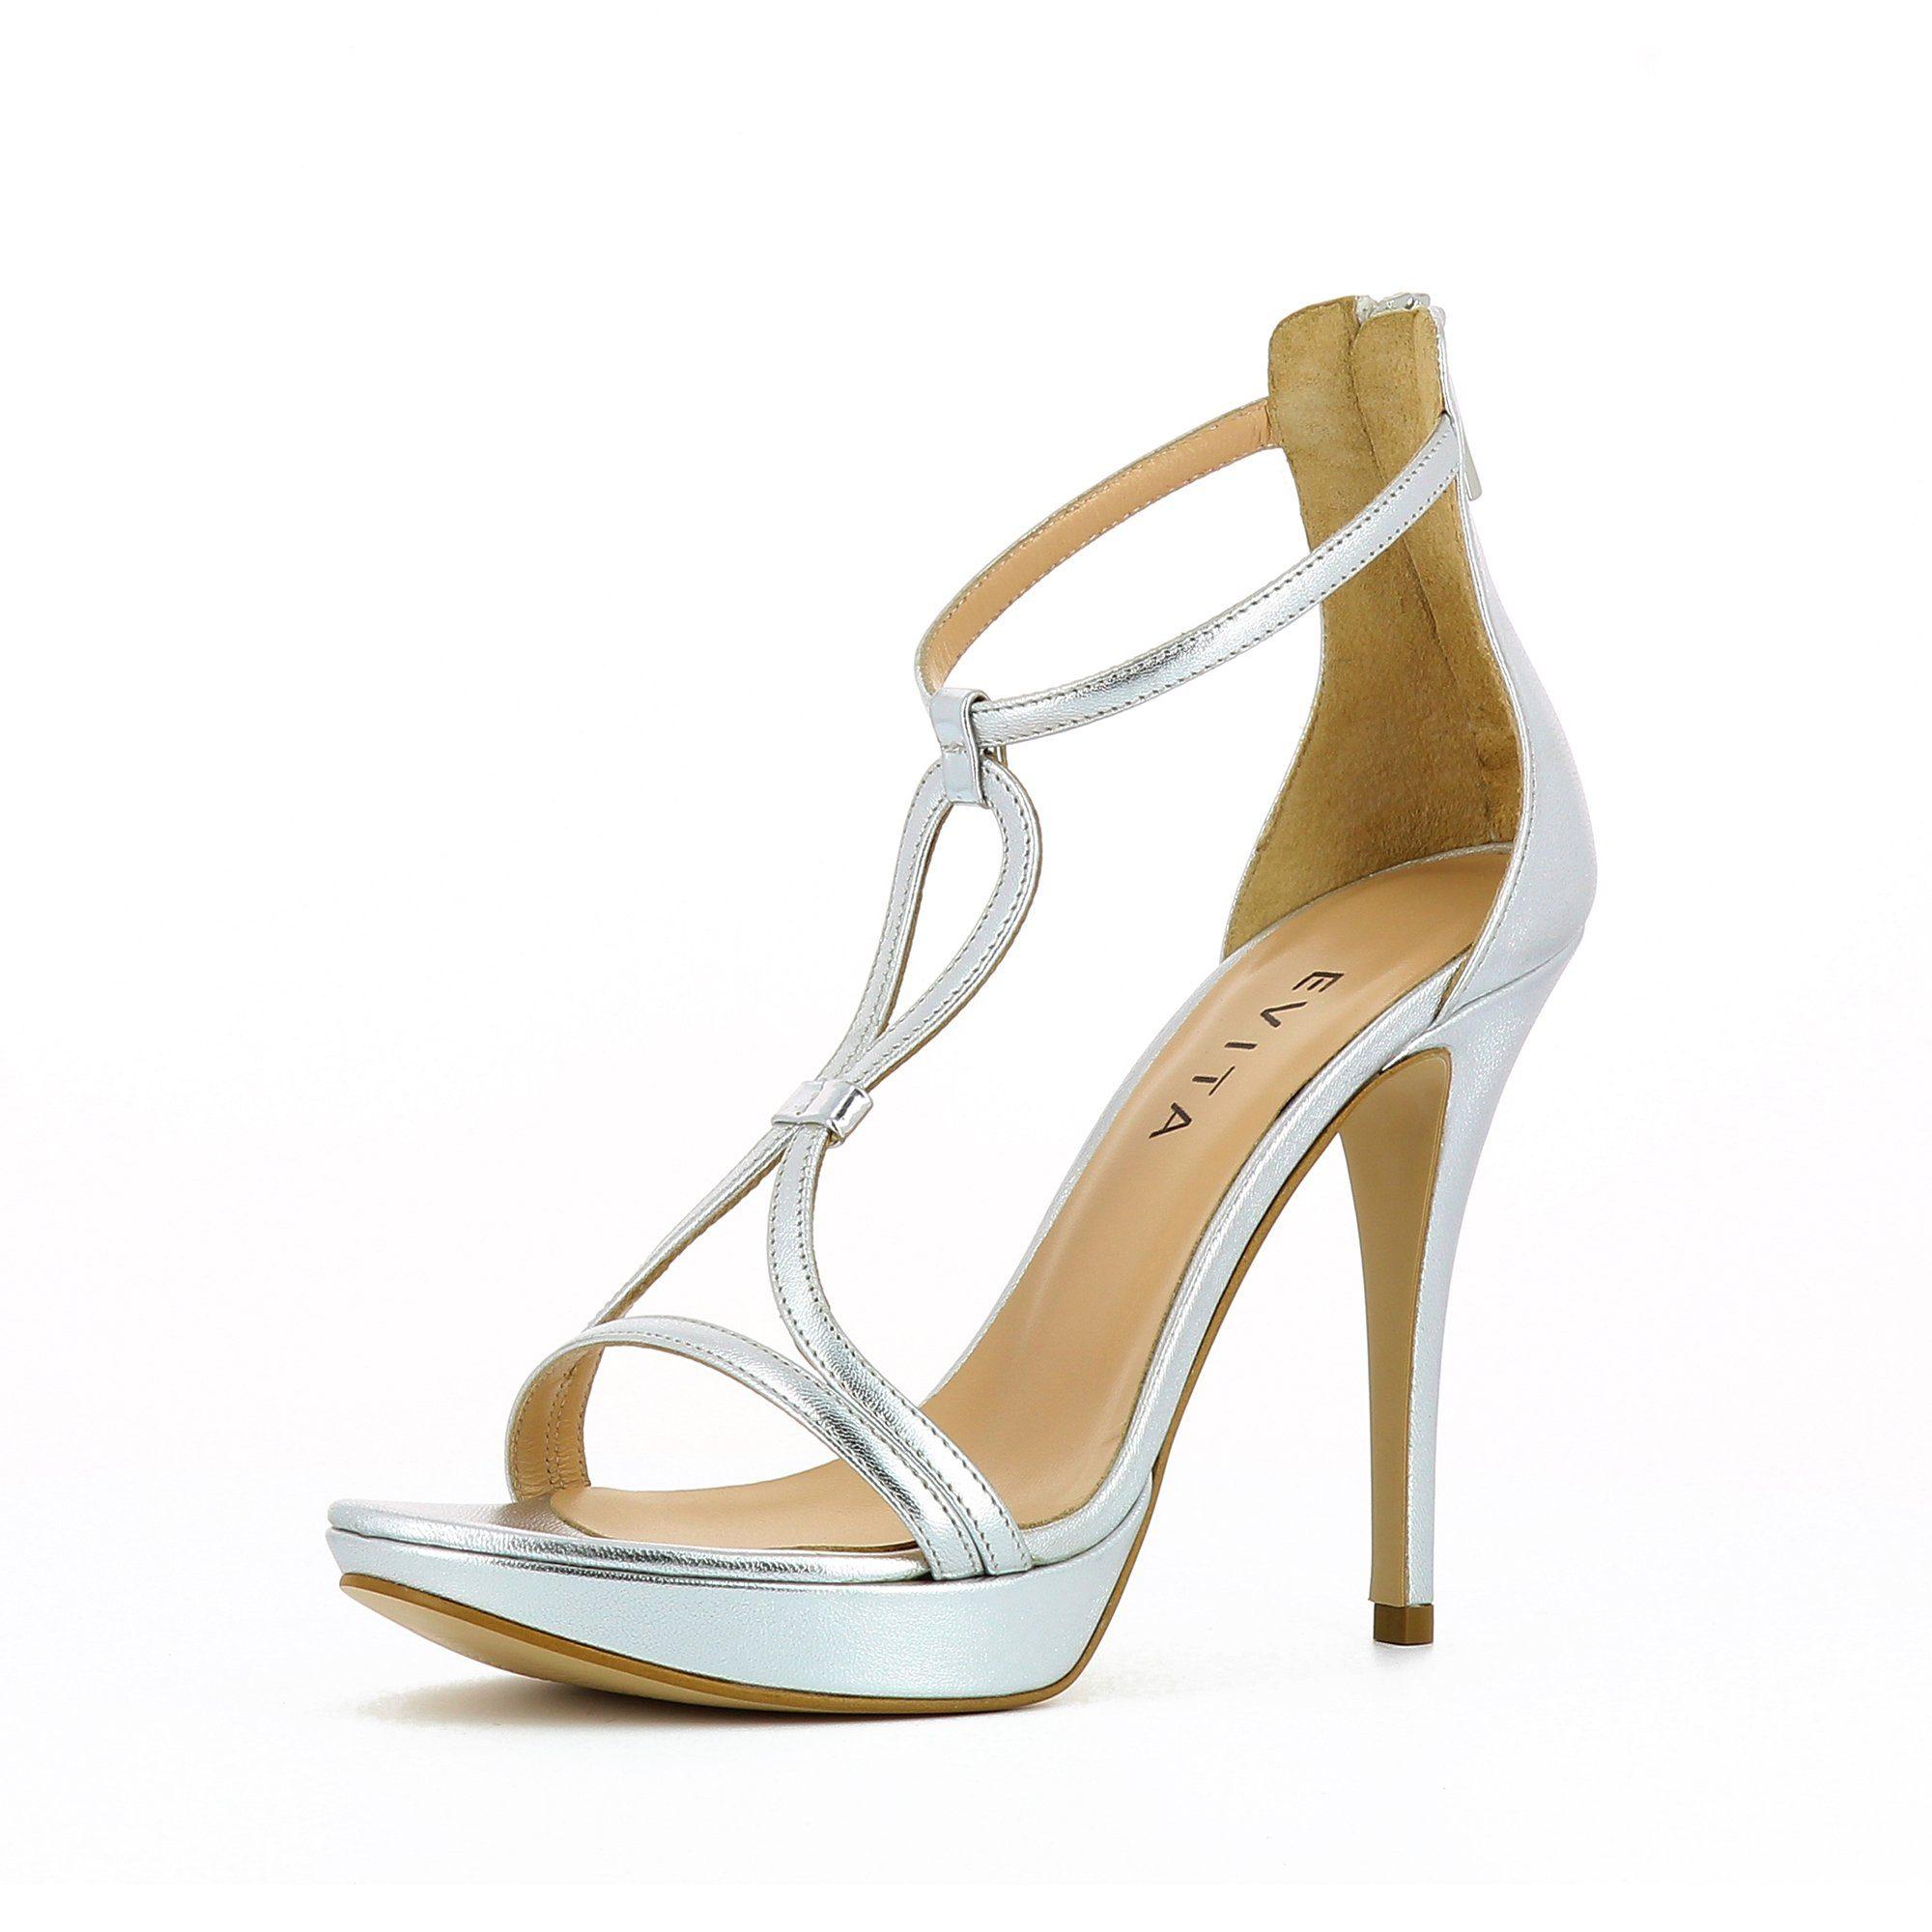 Evita »VALERIA« High-Heel-Sandalette, rosa, roségoldfarben